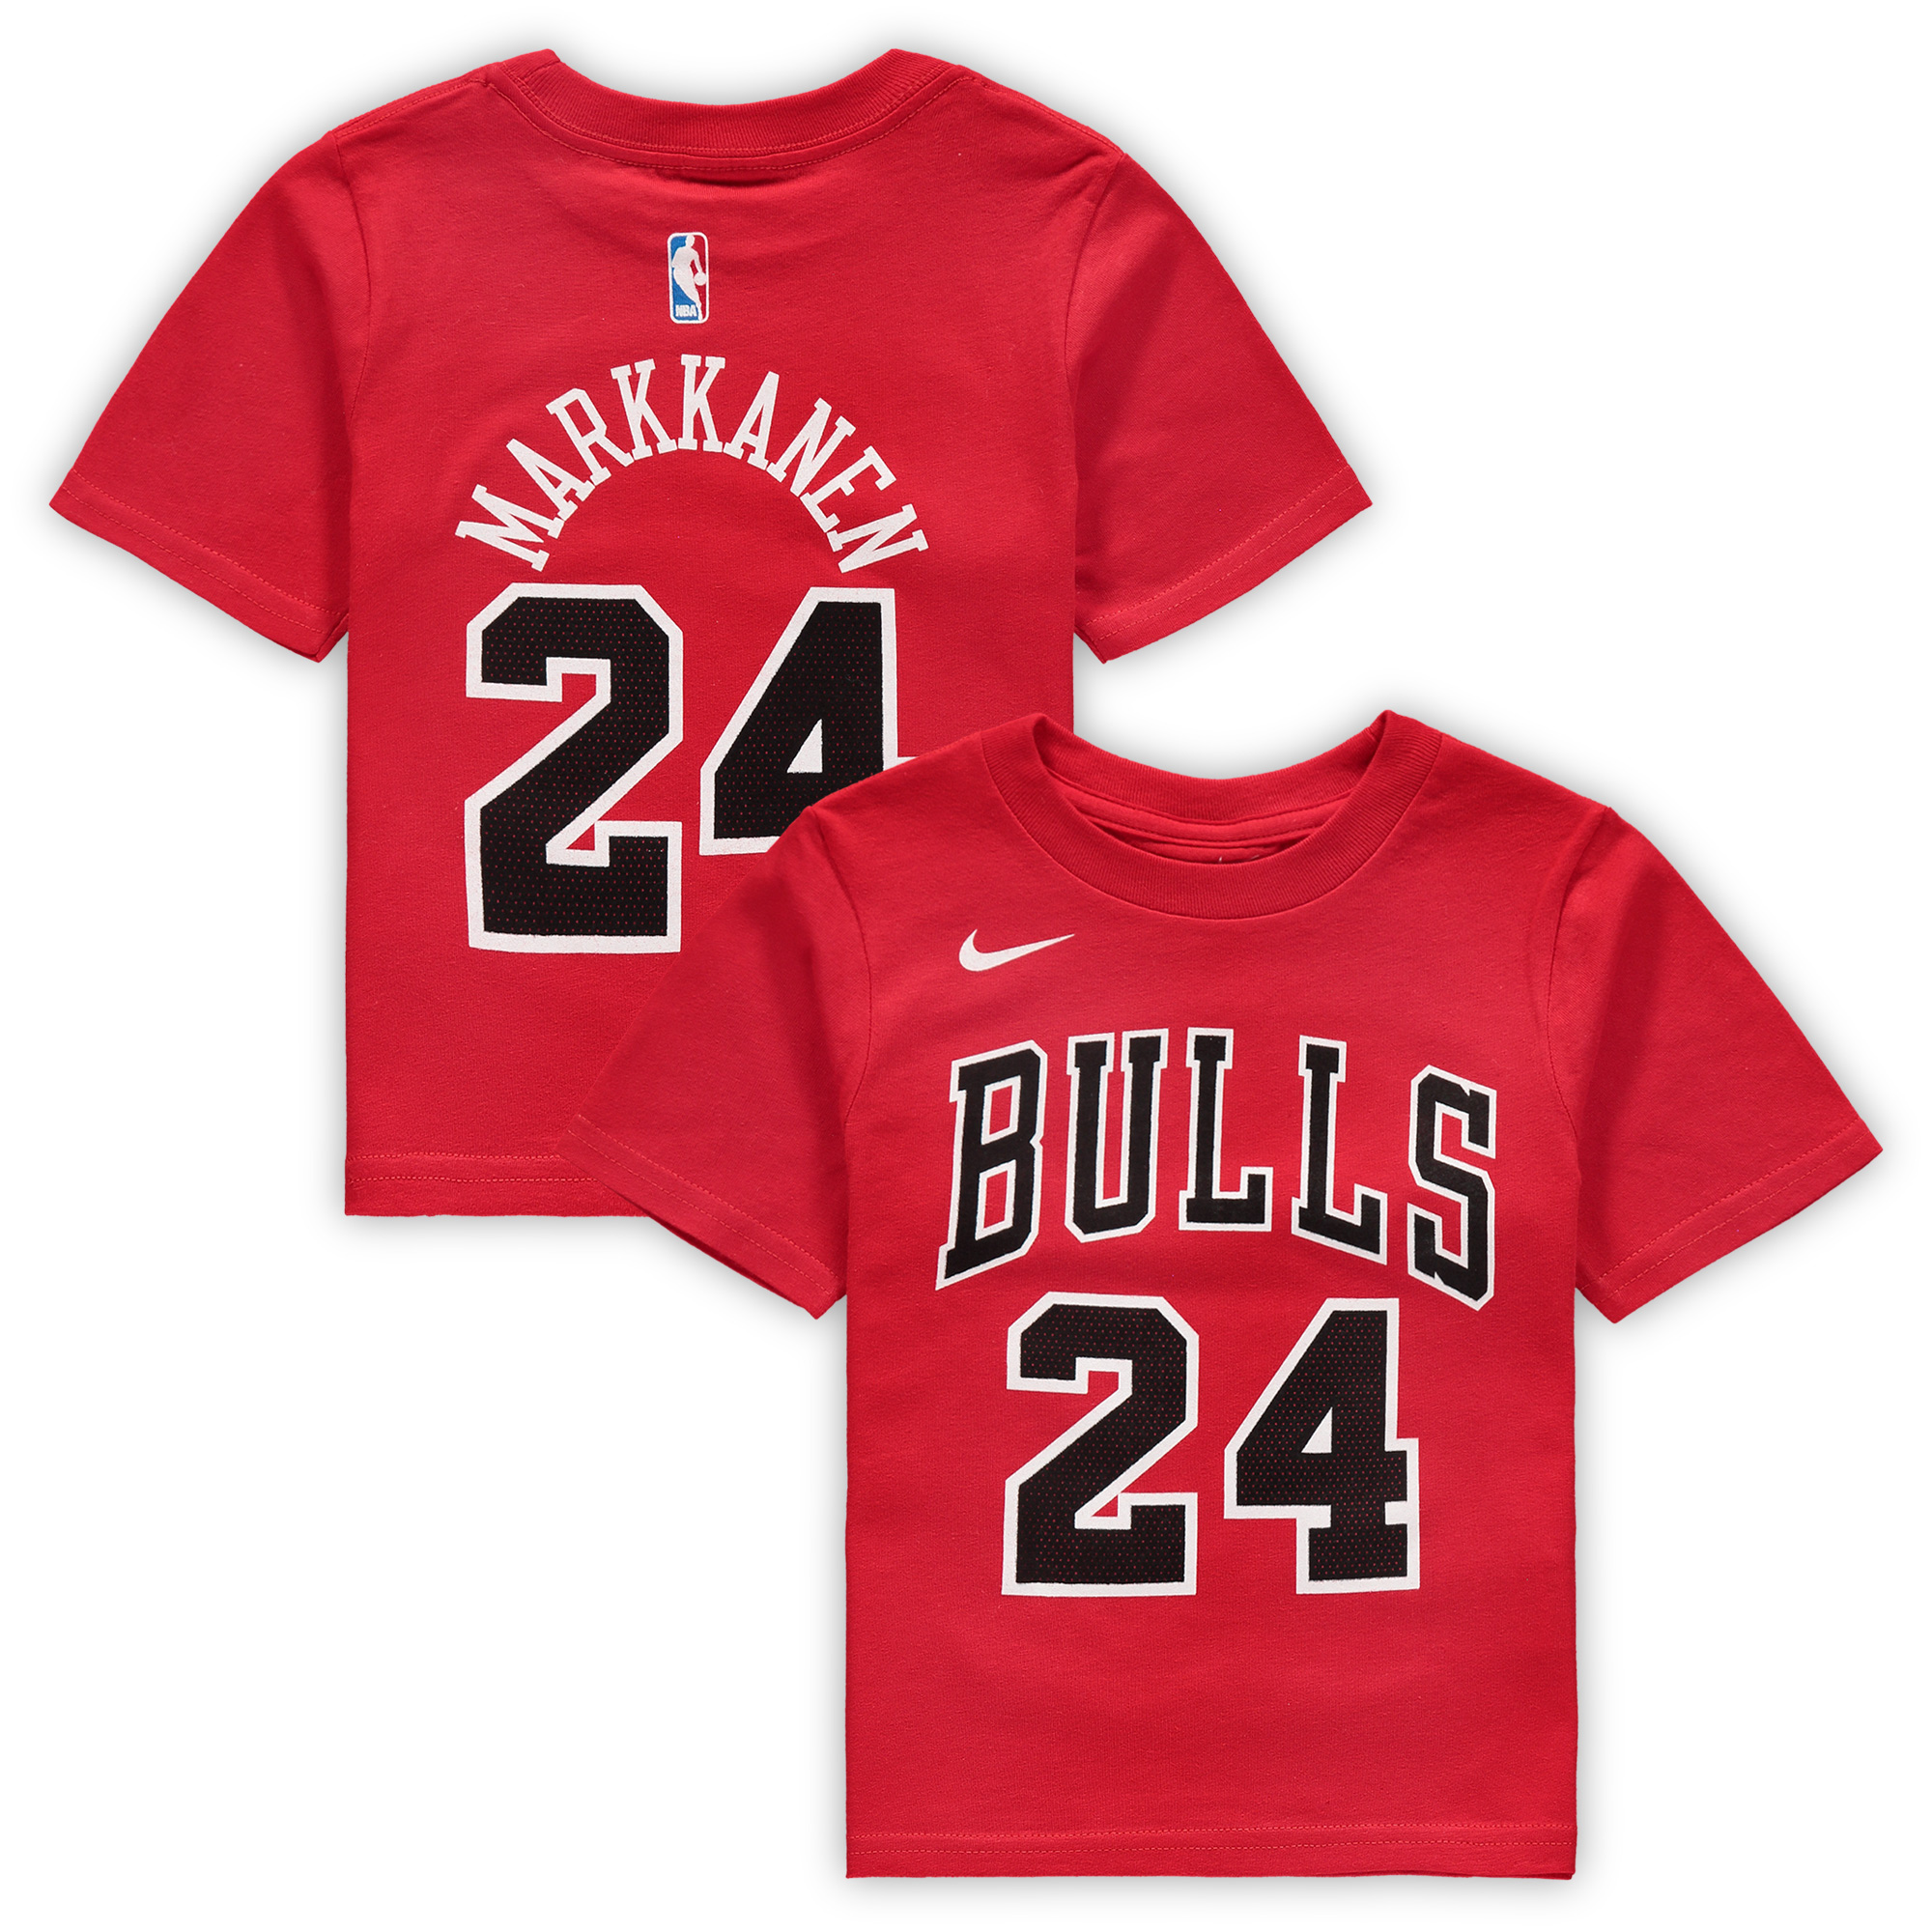 Lauri Markkanen Chicago Bulls Nike Toddler Name & Number T-Shirt - Red